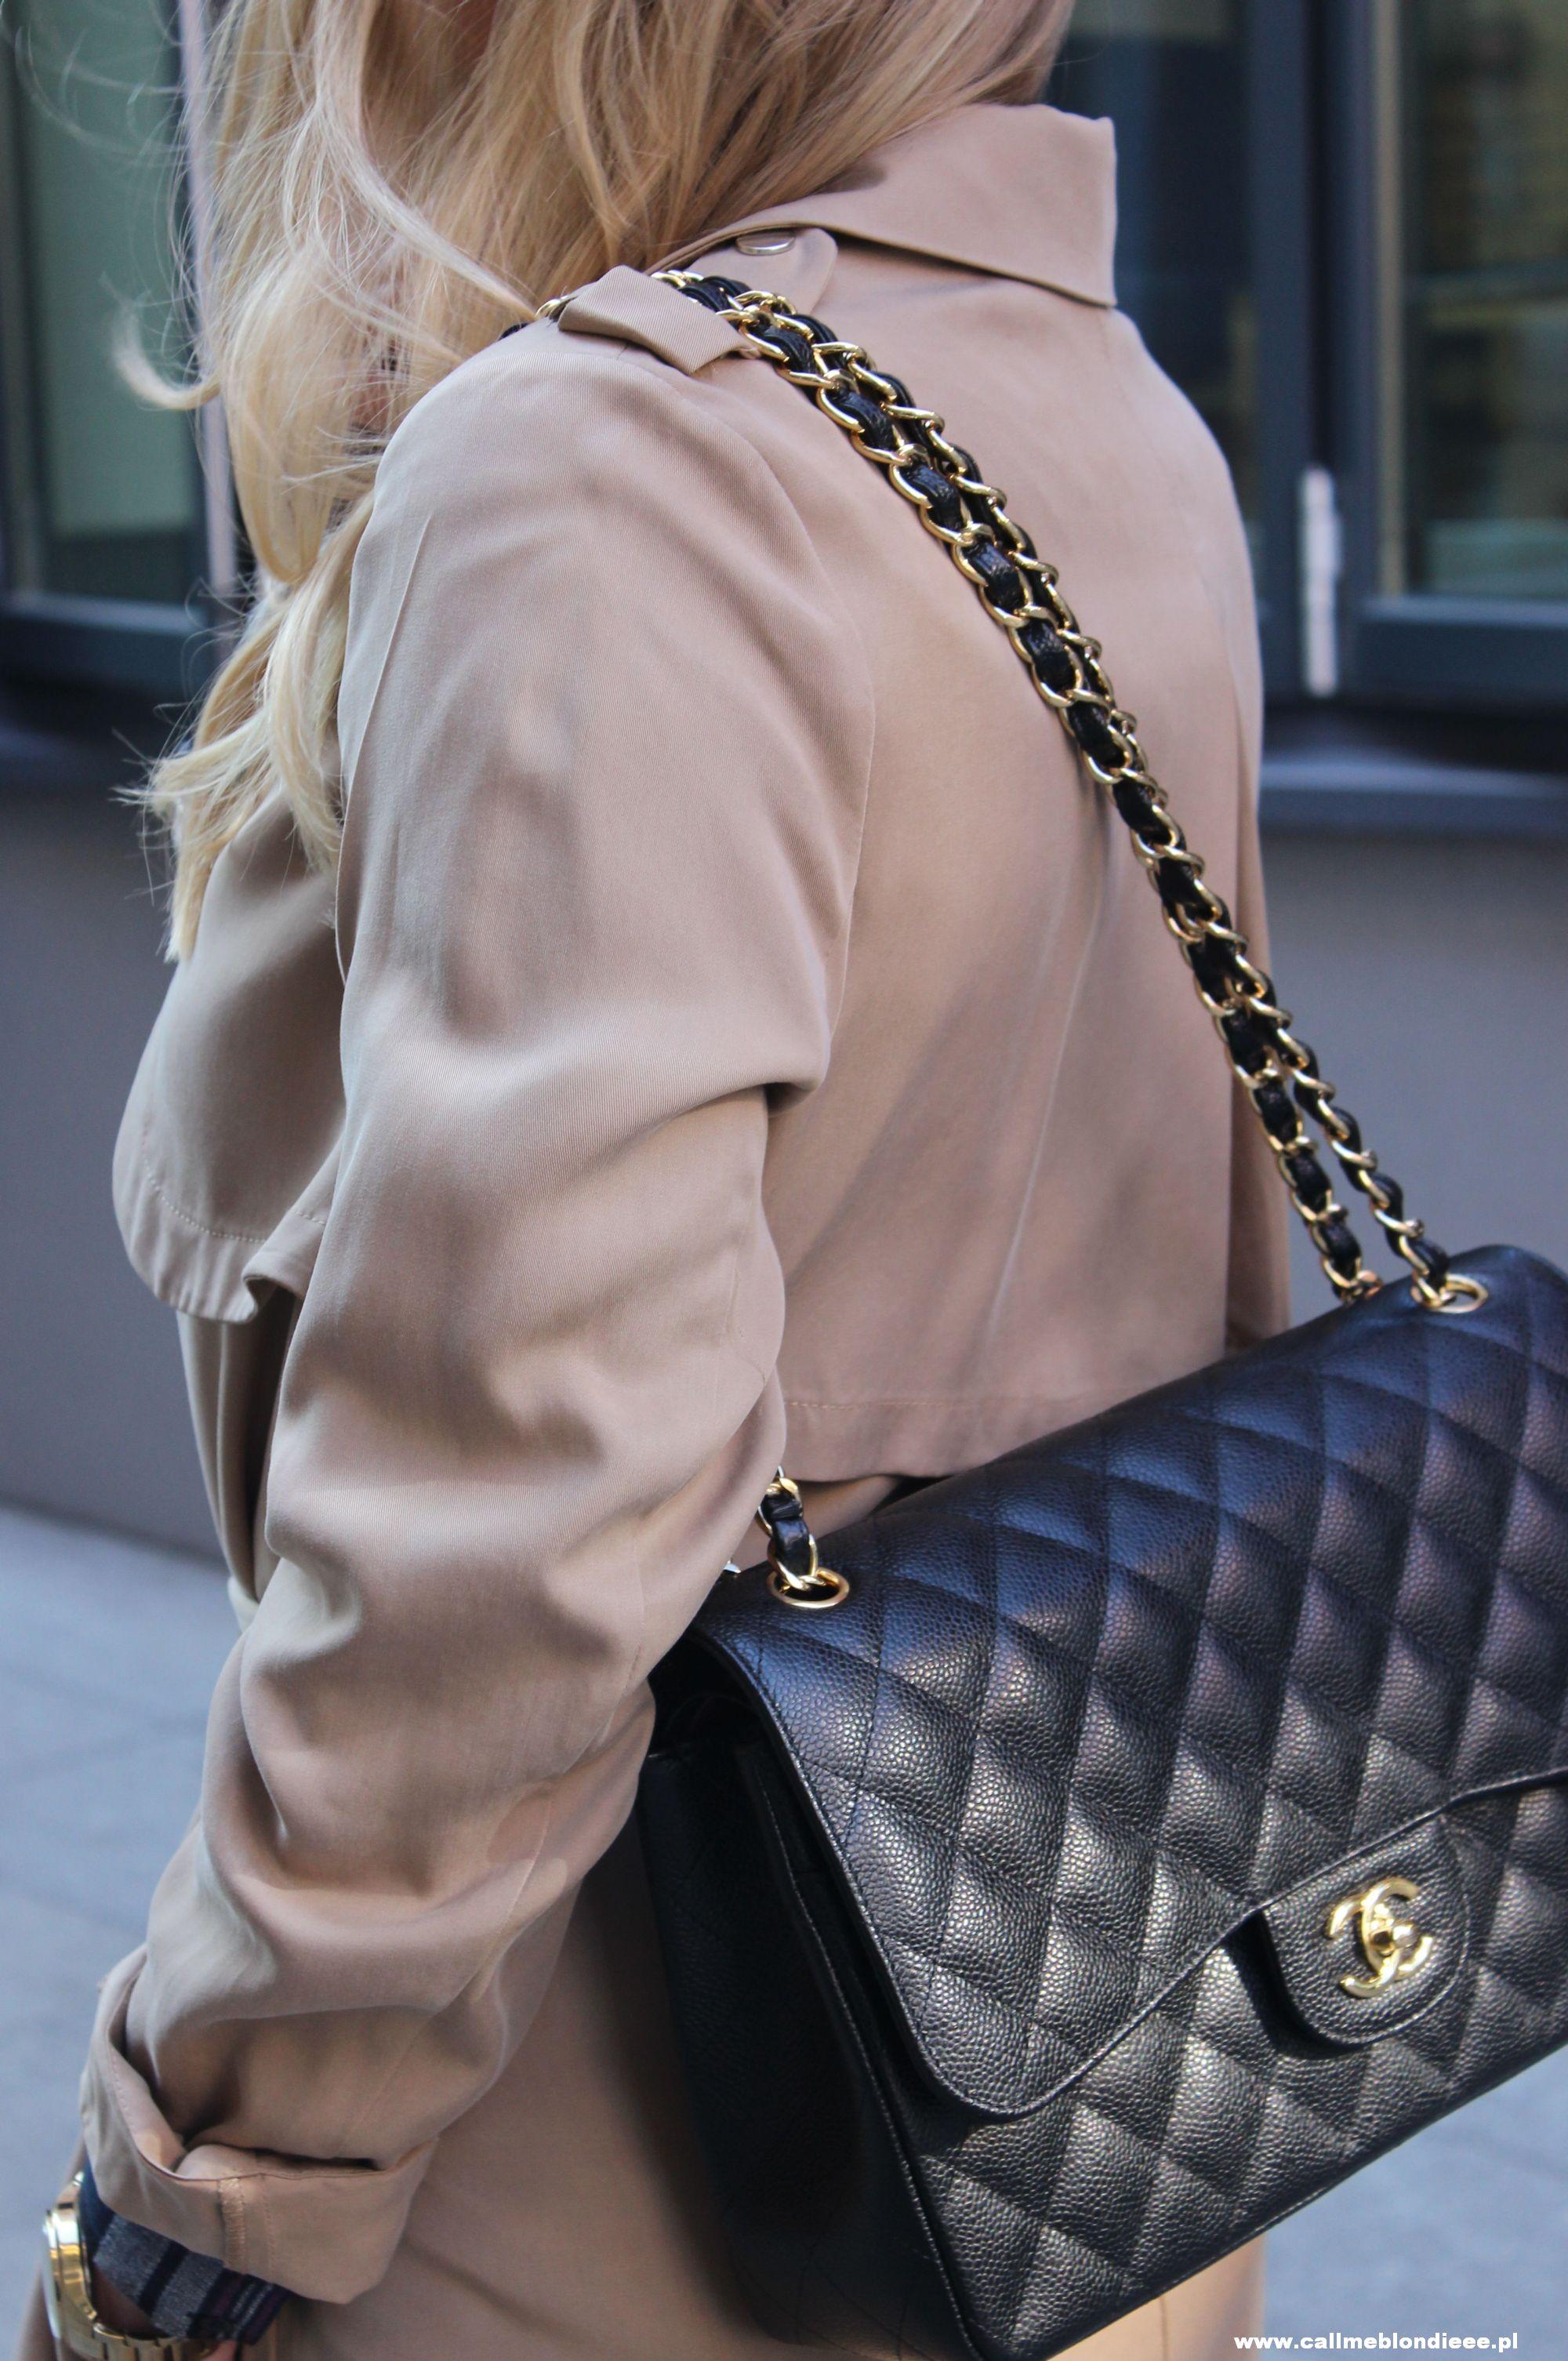 OOTD - Classic Look & Classic Bag 3